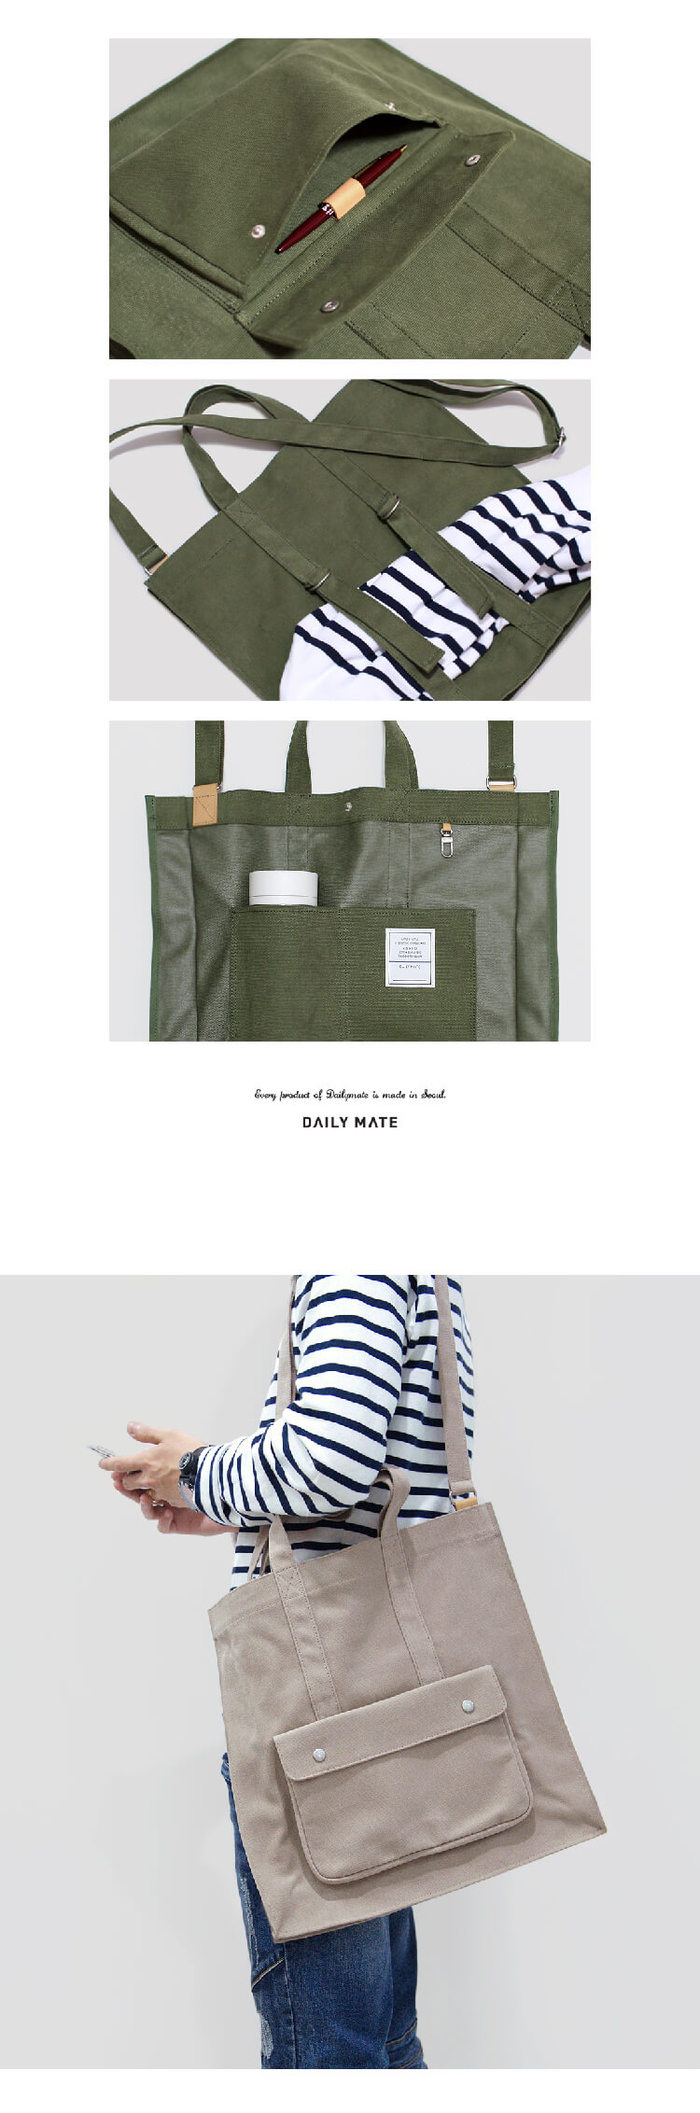 Daily mate|手提肩背大容量兩用包(軍綠)